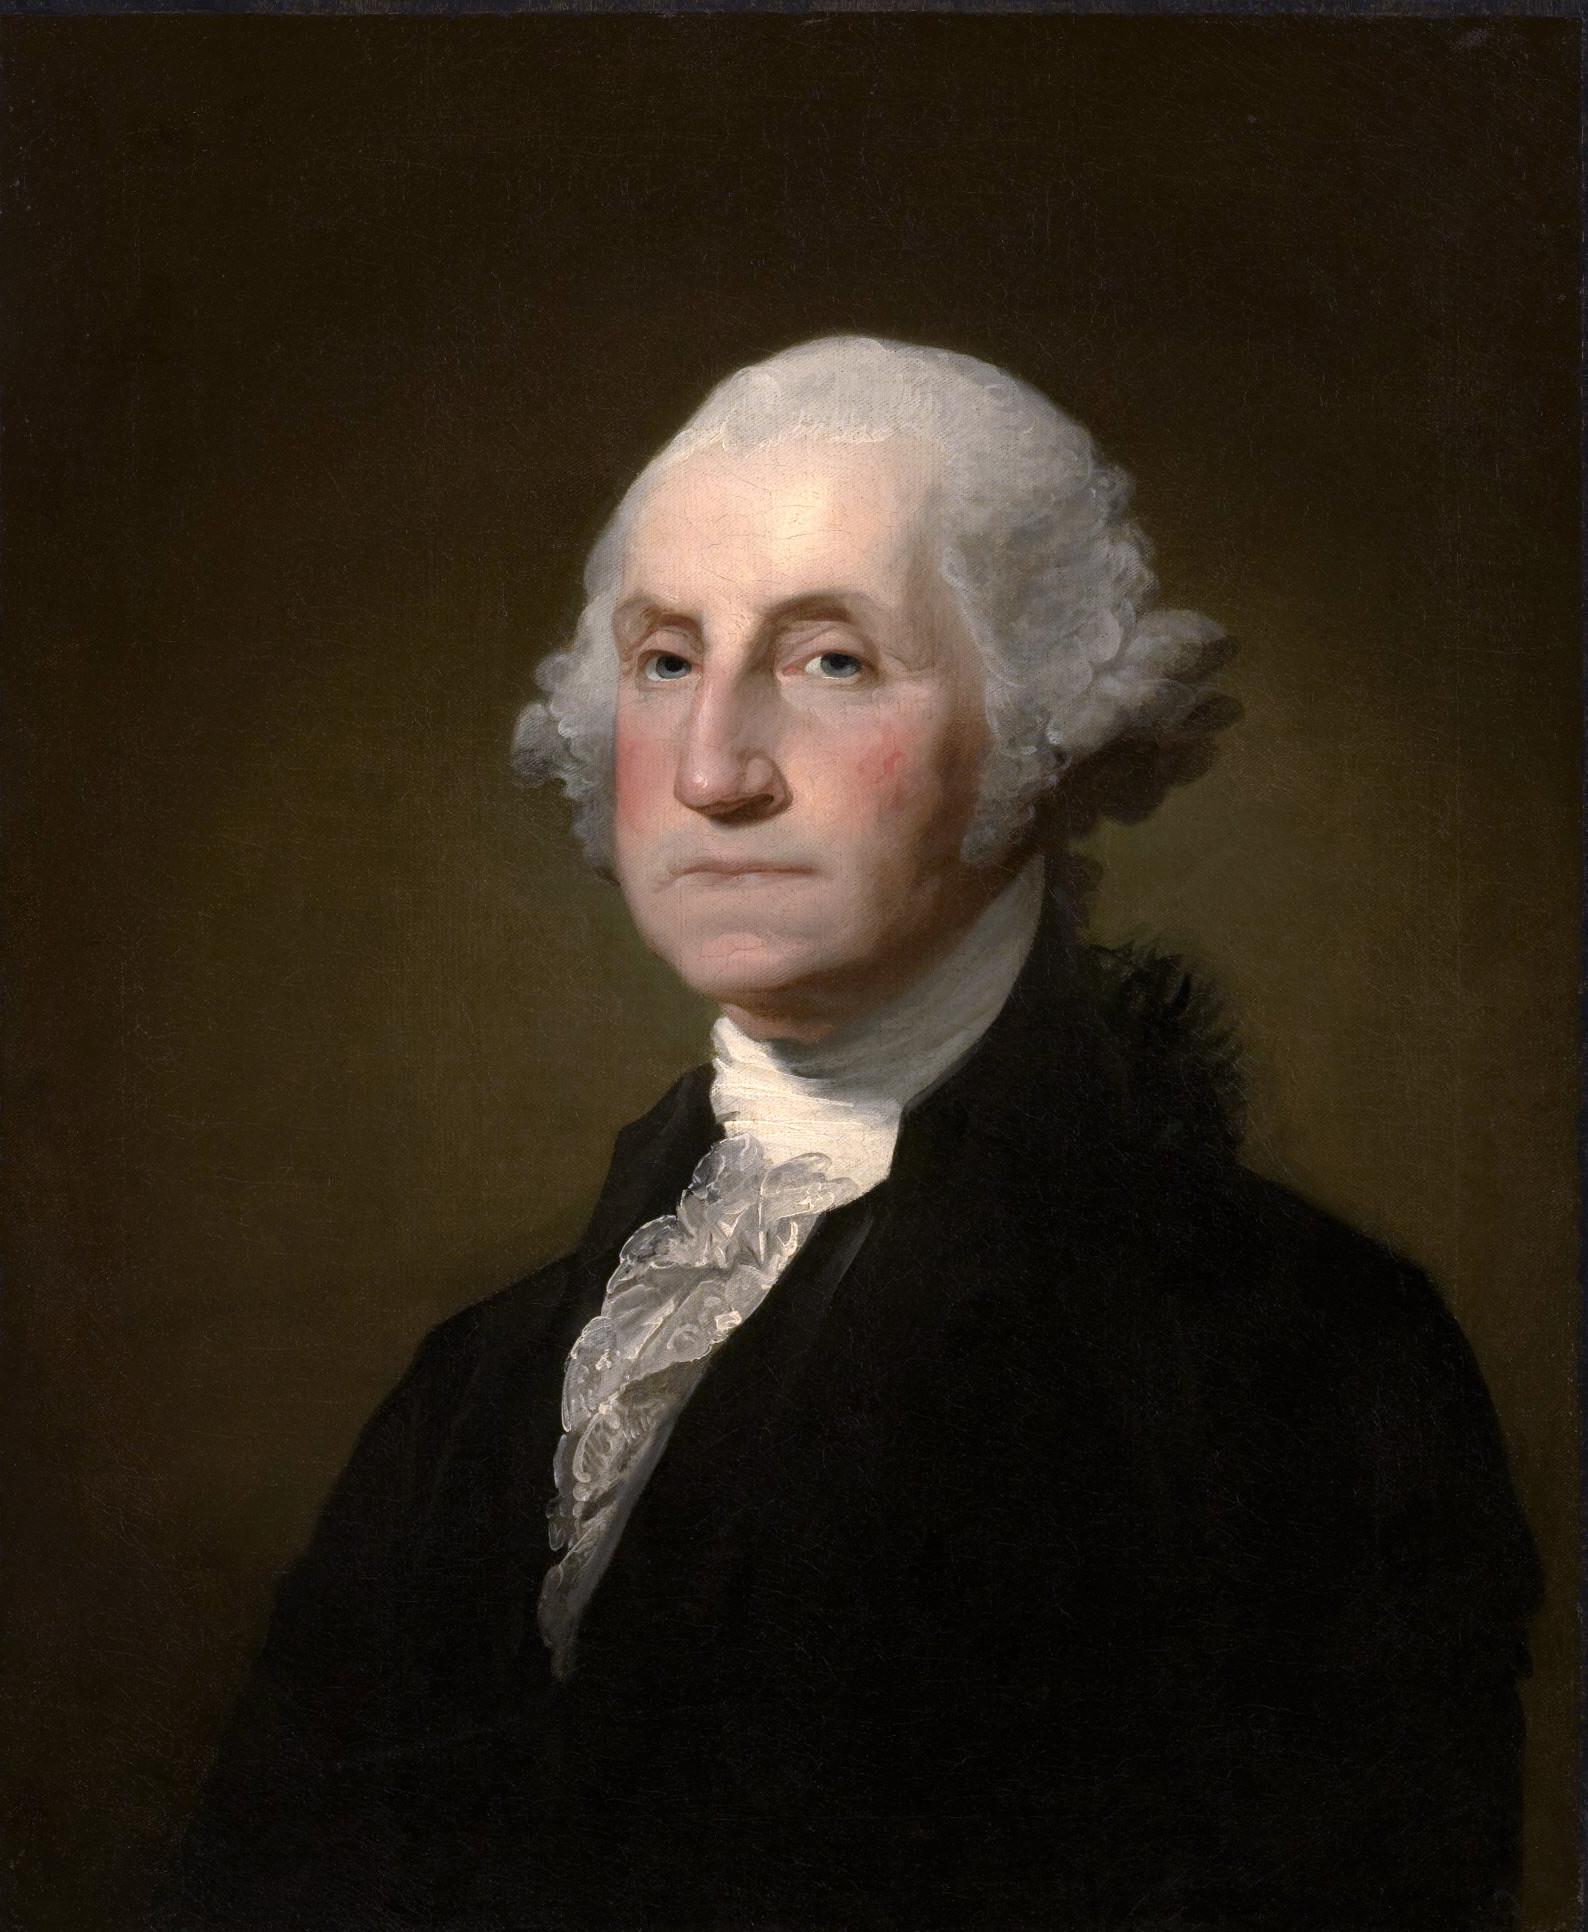 https://upload.wikimedia.org/wikipedia/commons/b/b6/Gilbert_Stuart_Williamstown_Portrait_of_George_Washington.jpg